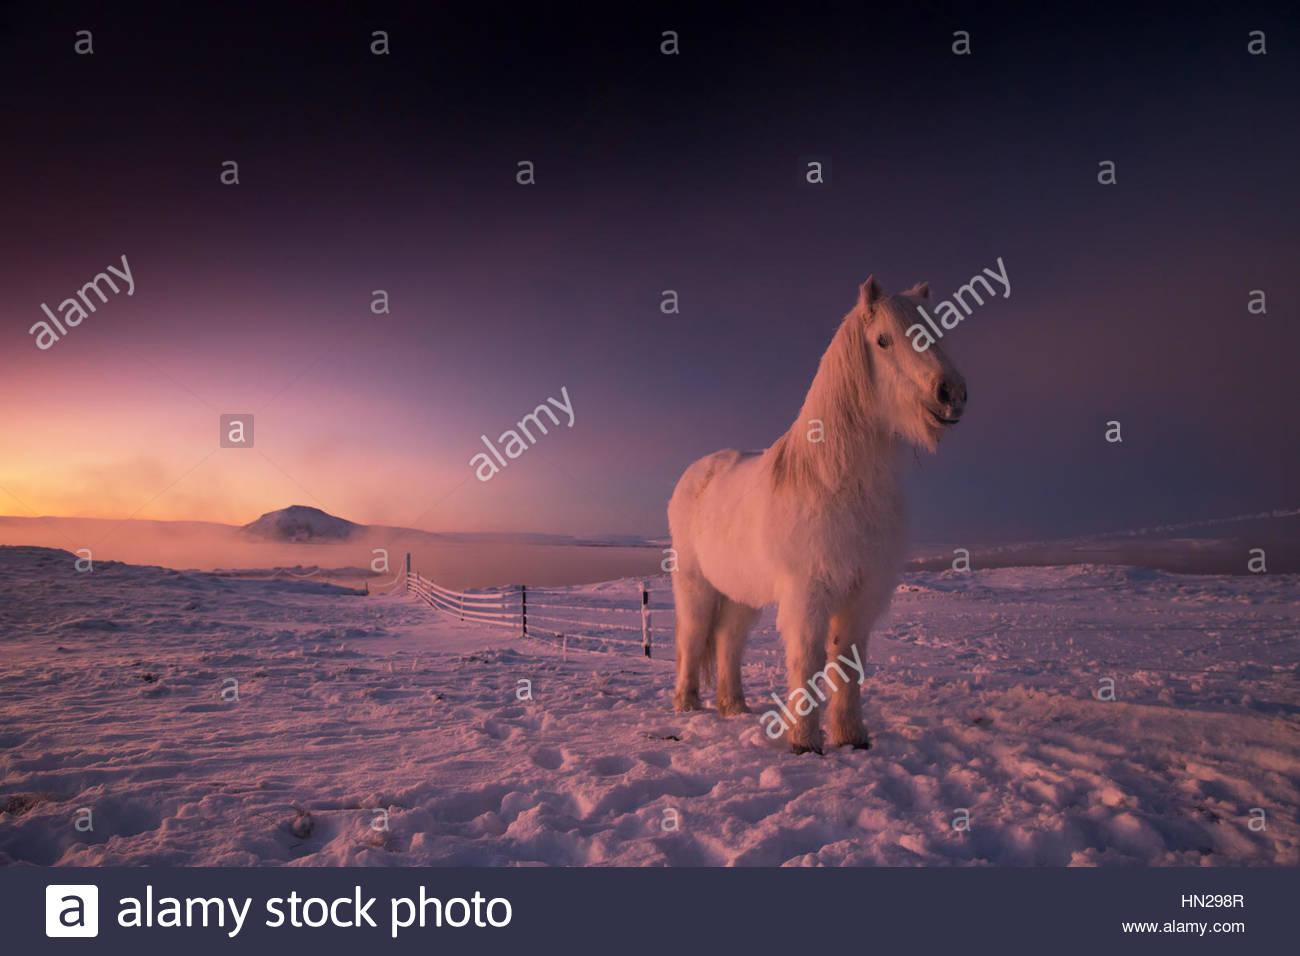 Icelandic horse, Equus ferus caballus, on snowy farm during sunset in Iceland. Stock Photo